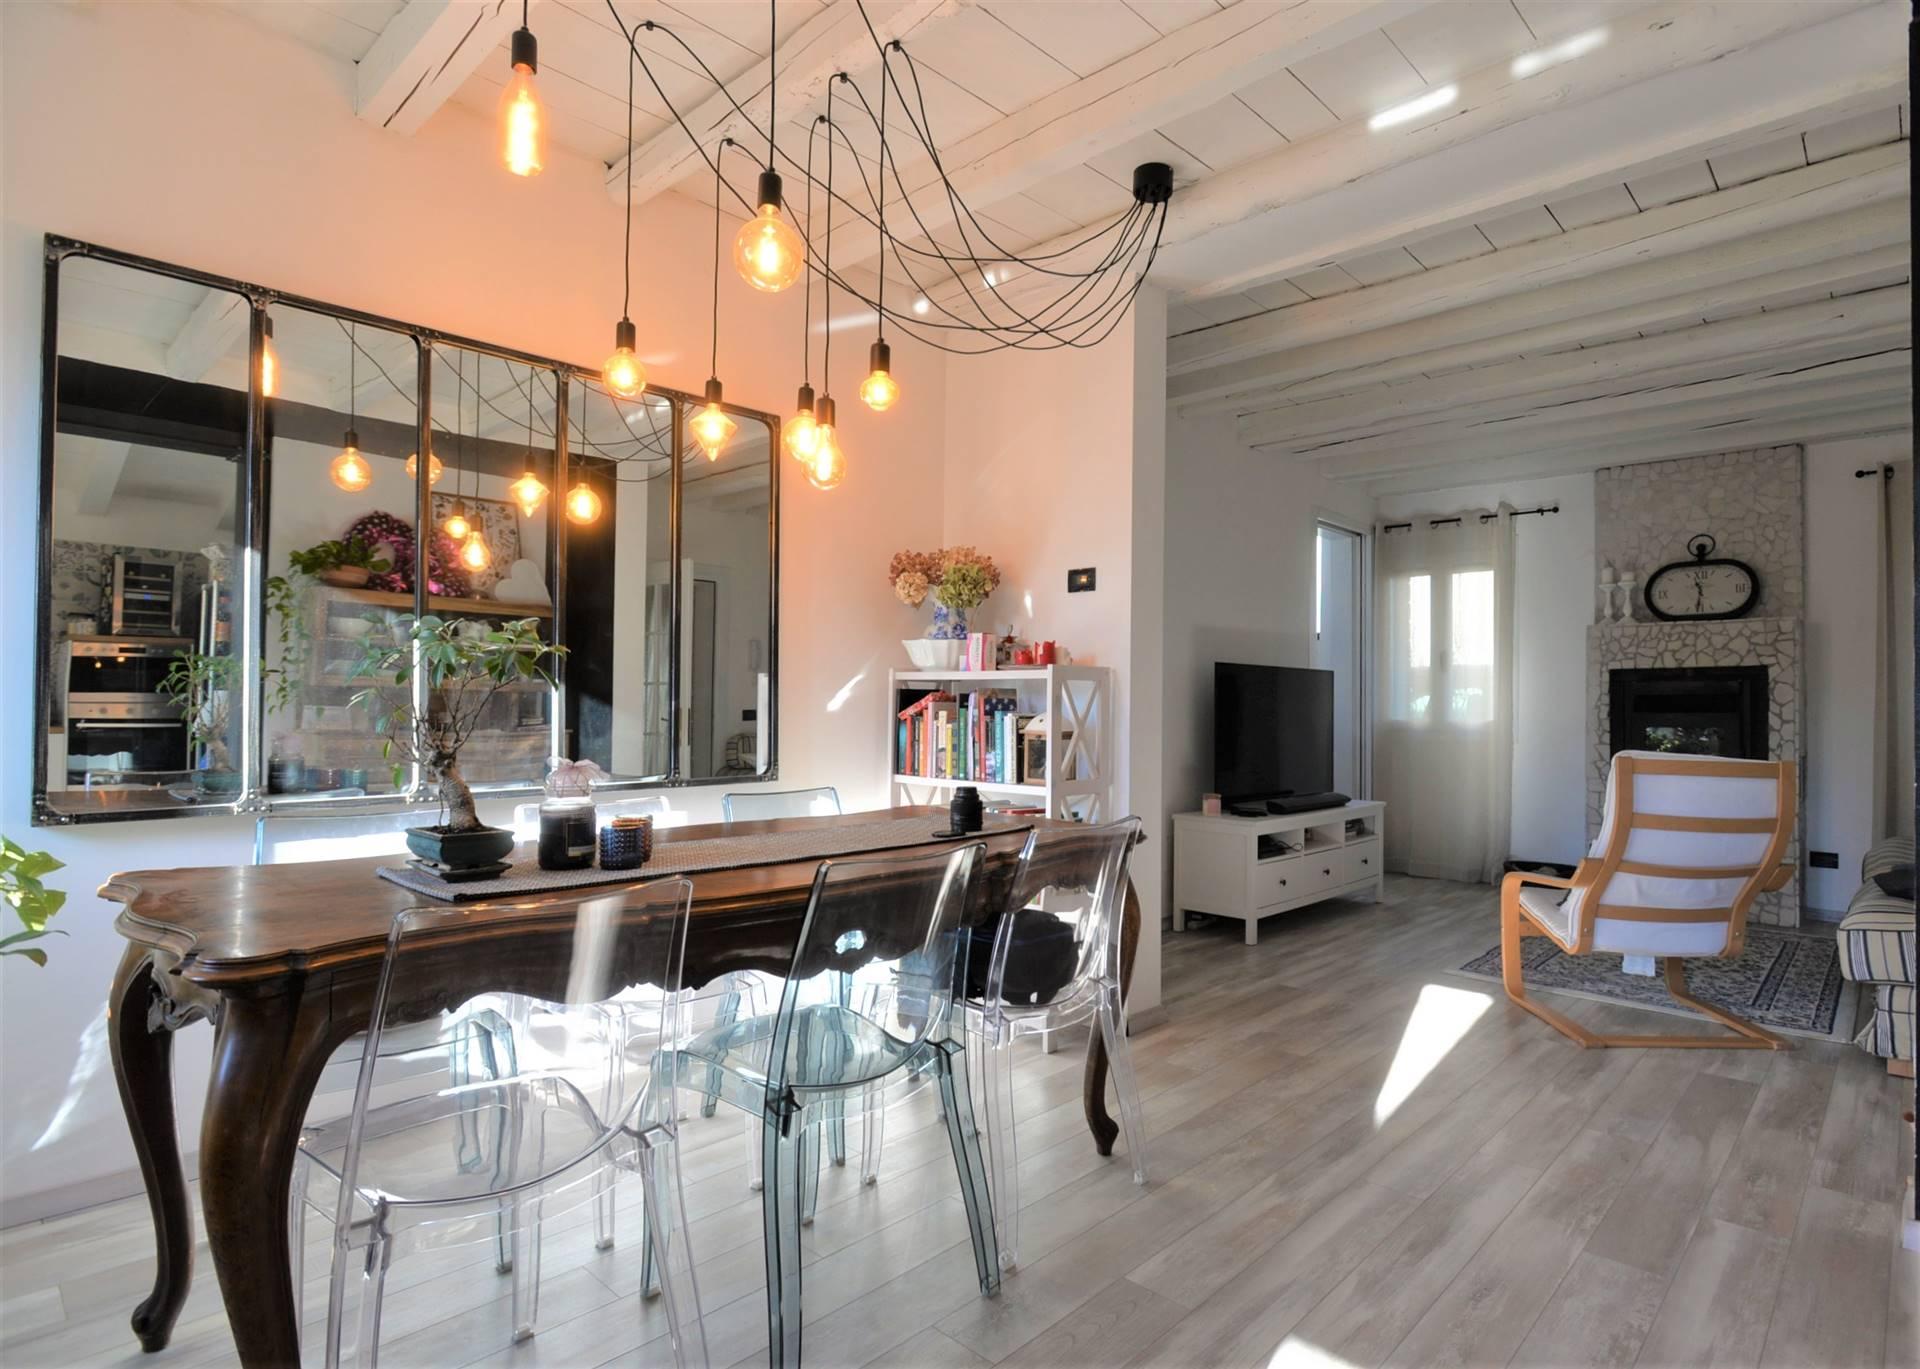 PARROCCHIA SAN BARTOLOMEO APOSTOLO IN SALZANO, SALZANO, Semi detached house for sale of 110 Sq. mt., Restored, Heating Individual heating system,